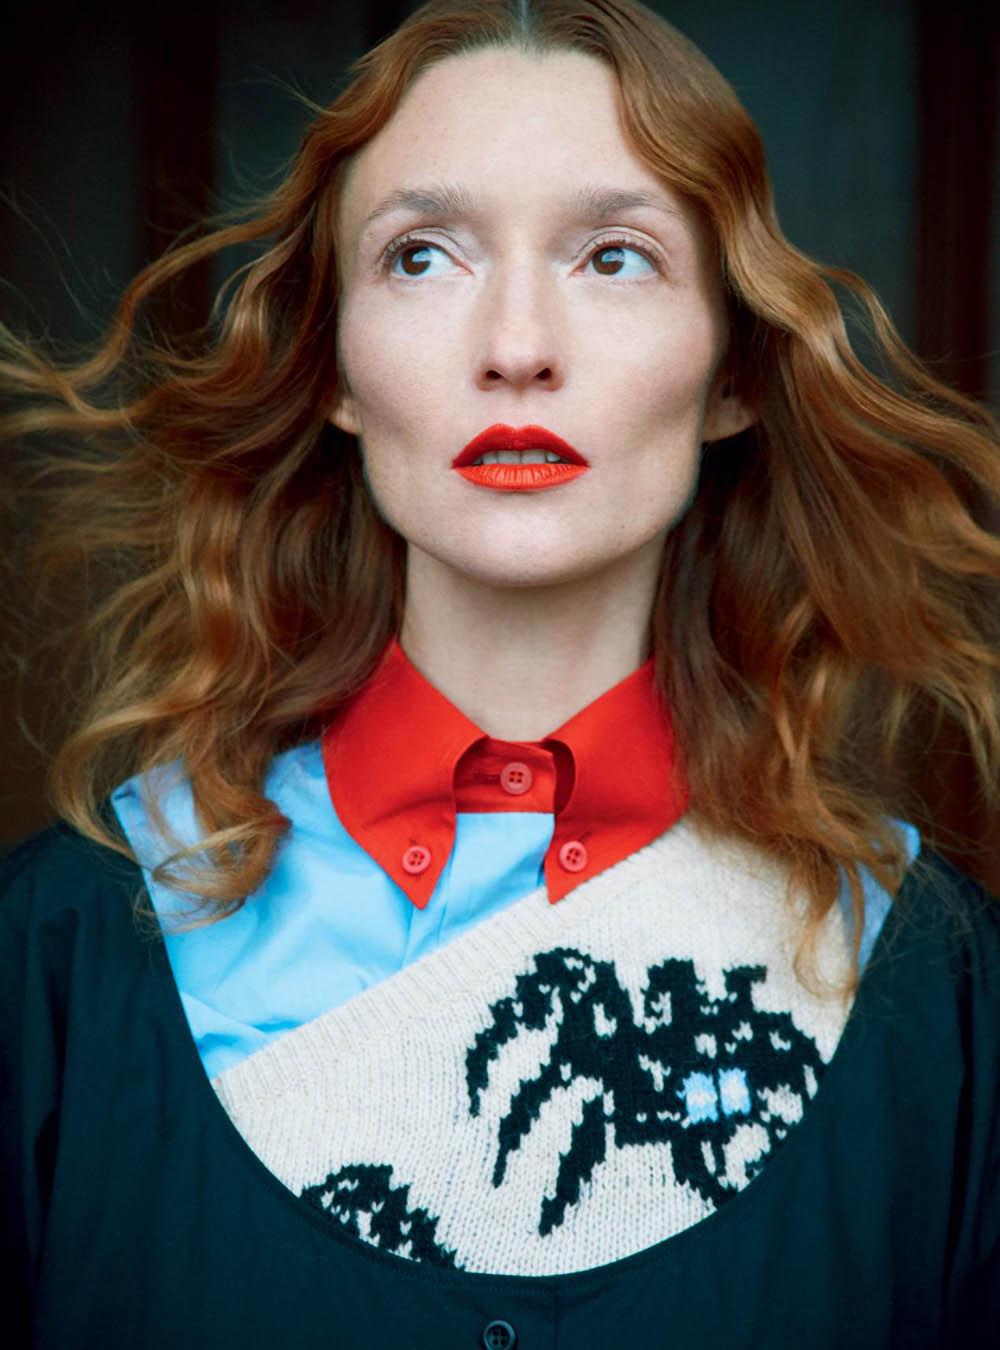 Audrey Marnay by Erik Madigan Heck for Harper's Bazaar UK April 2018